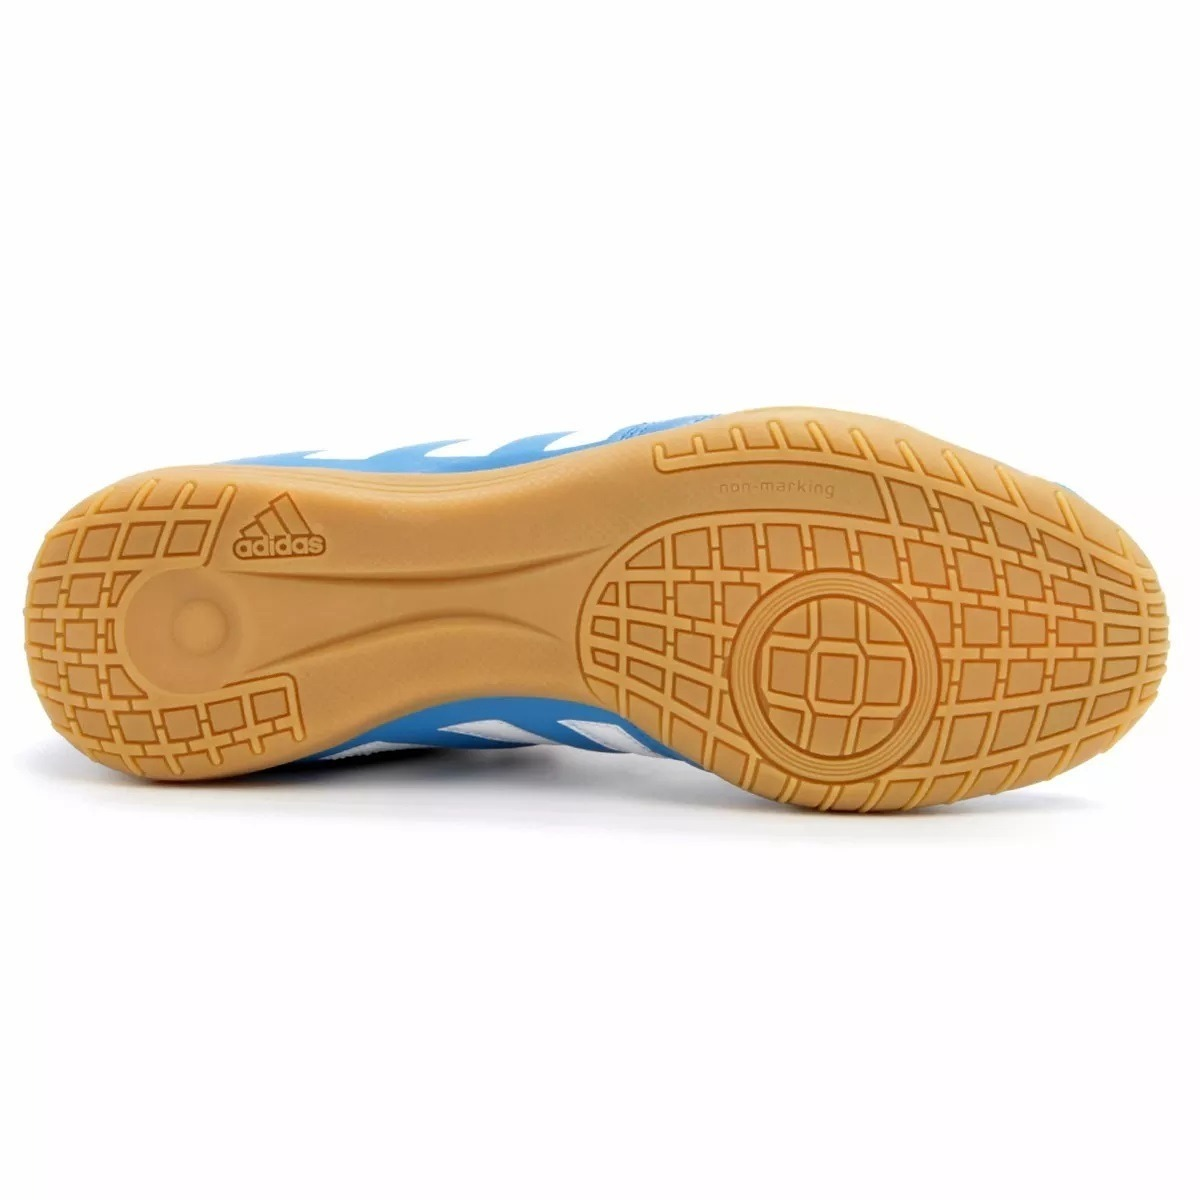 986bdc7122 Chuteira adidas Gloro 16.2 - Futsal - Original - R  279